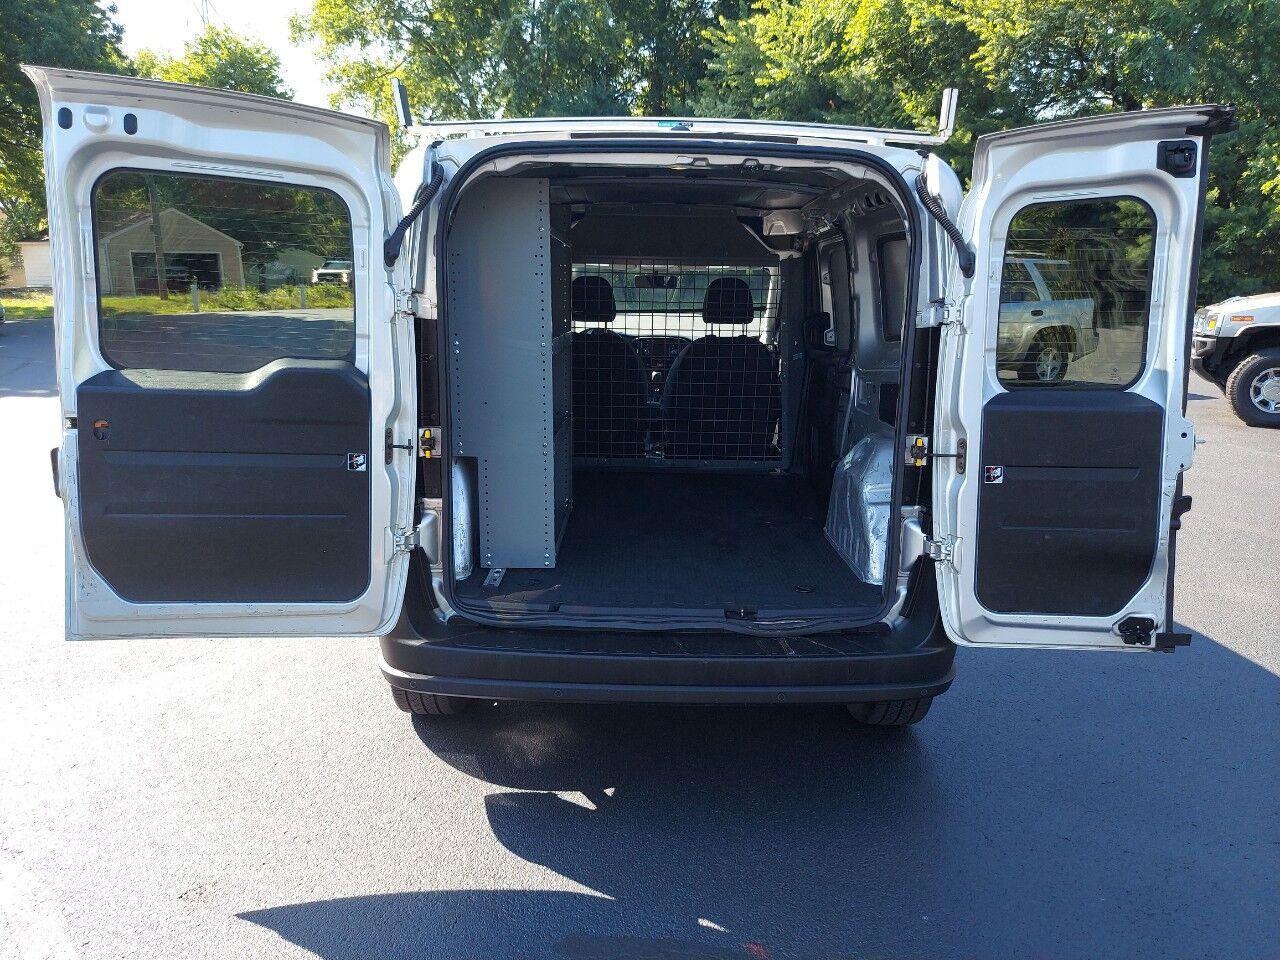 2015 Ram ProMaster City Cargo Mini-van, Cargo